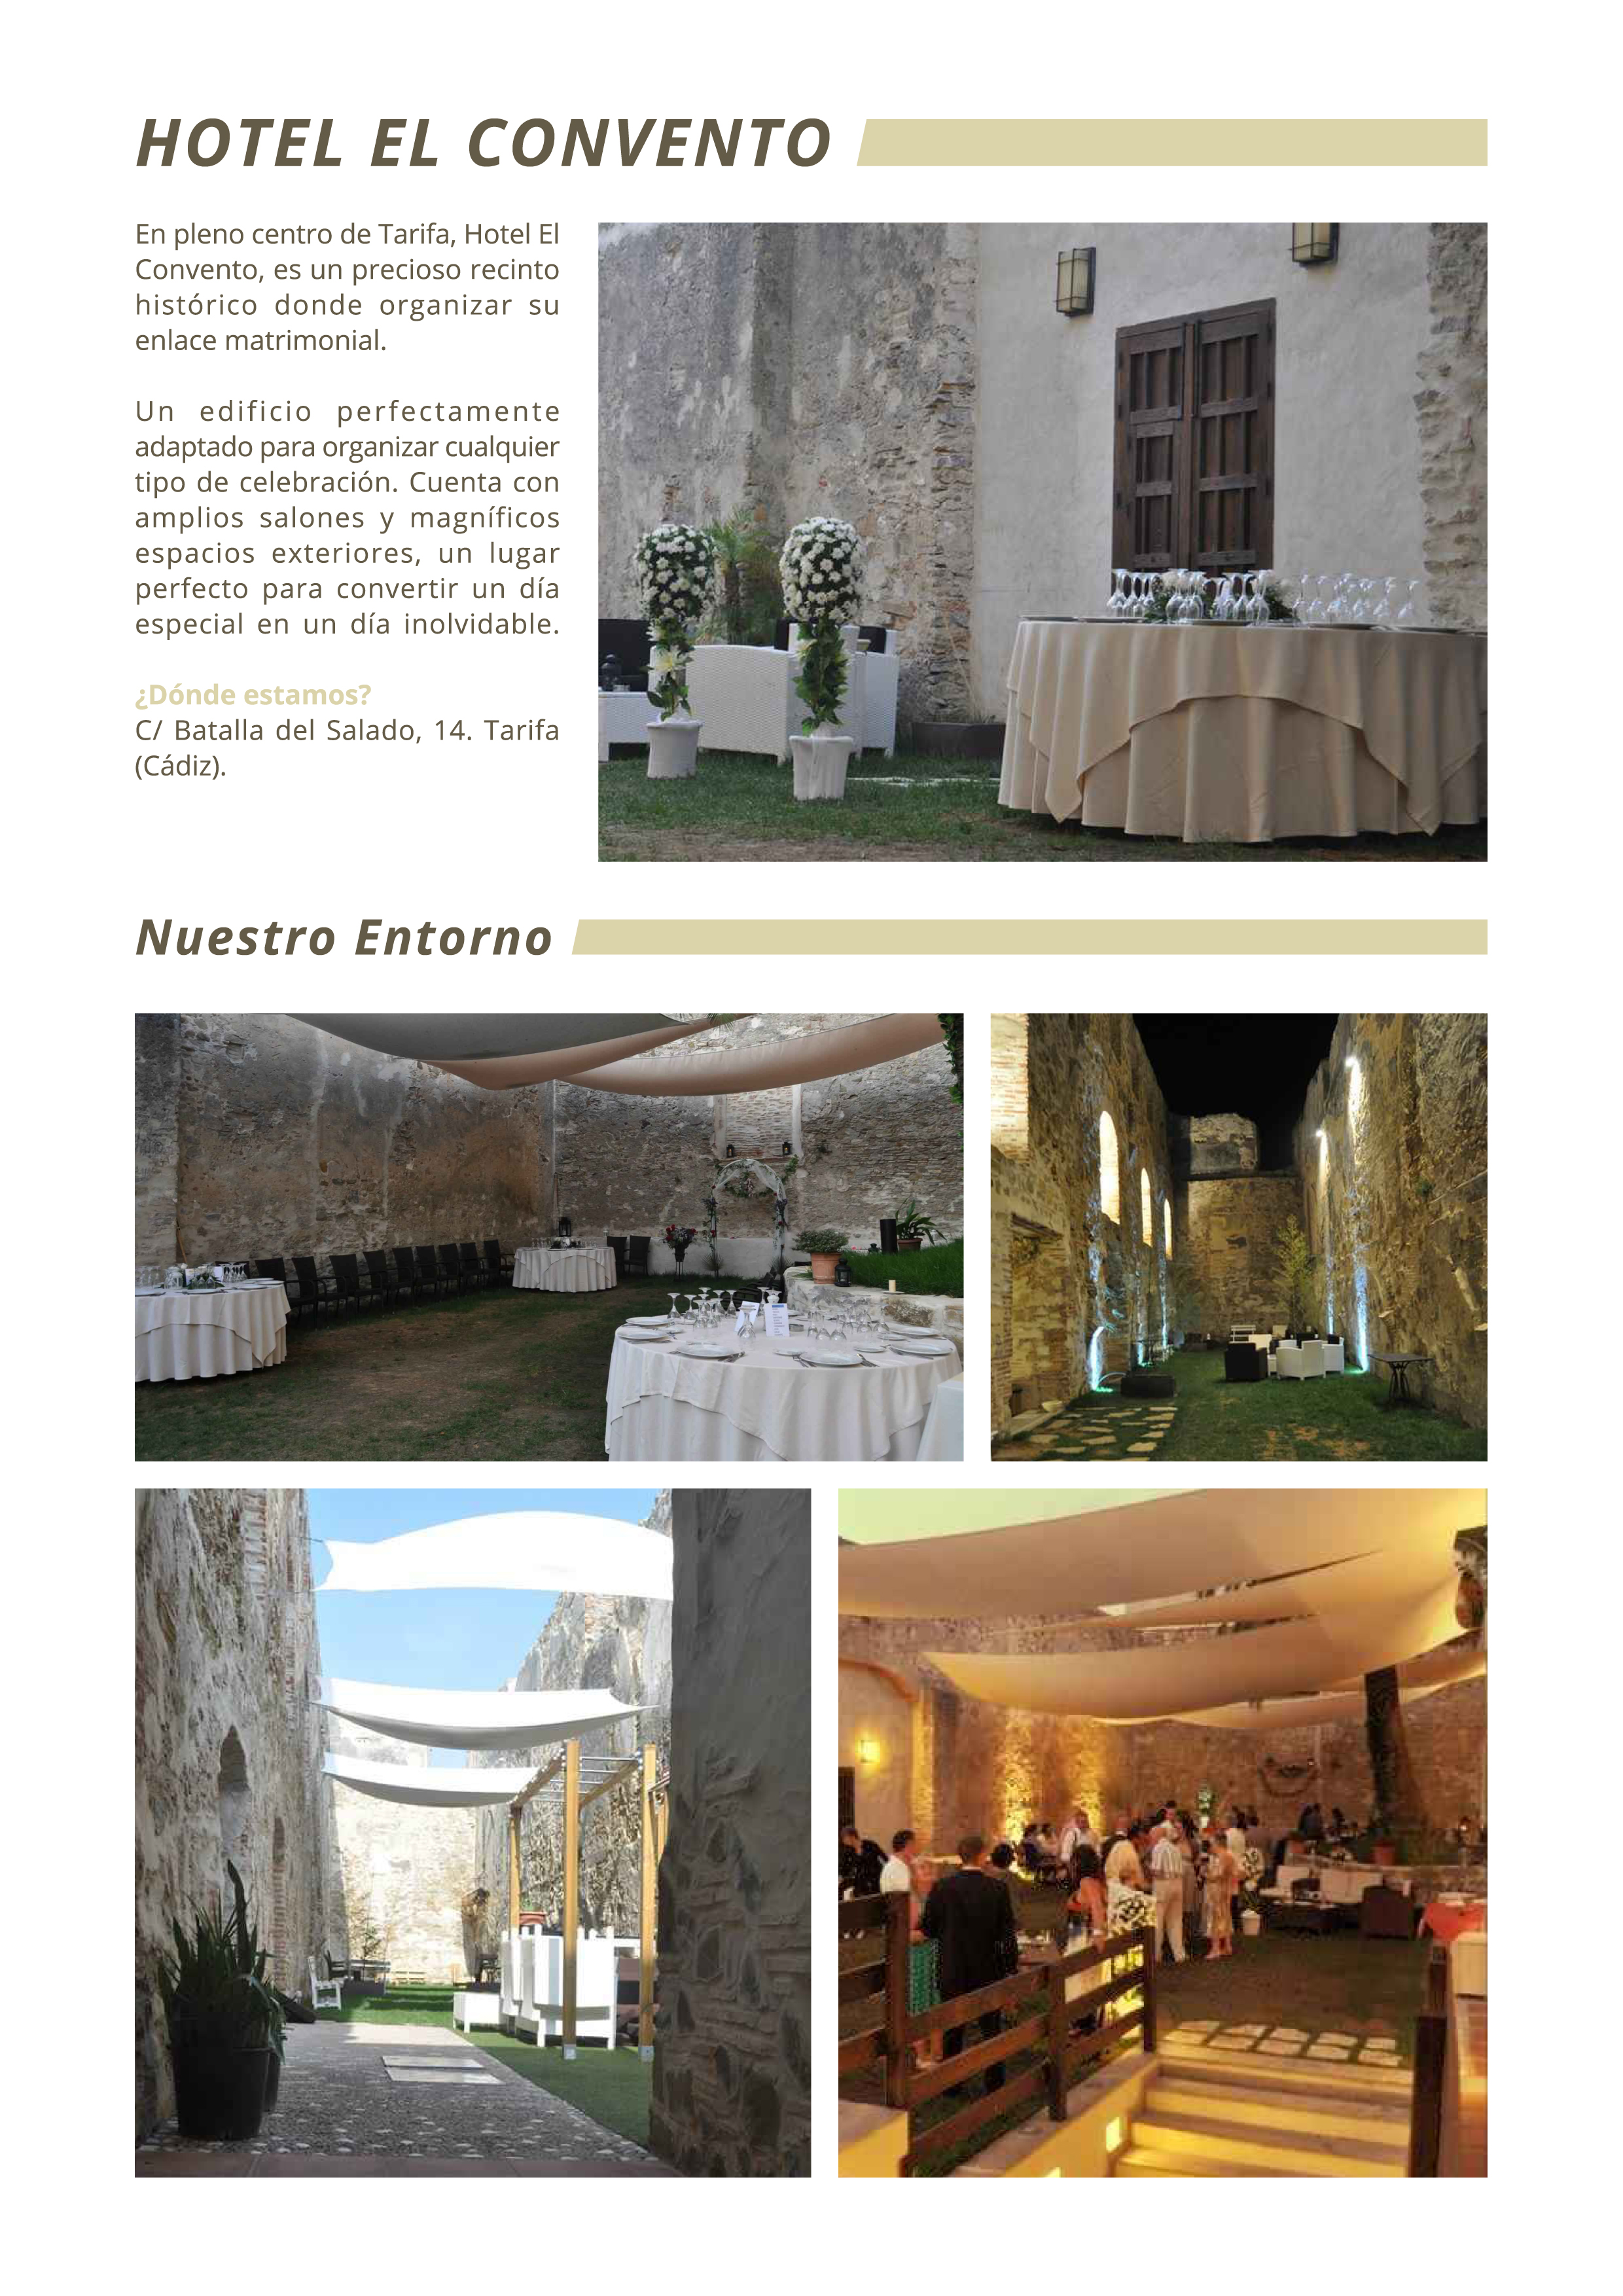 HotelElConvento